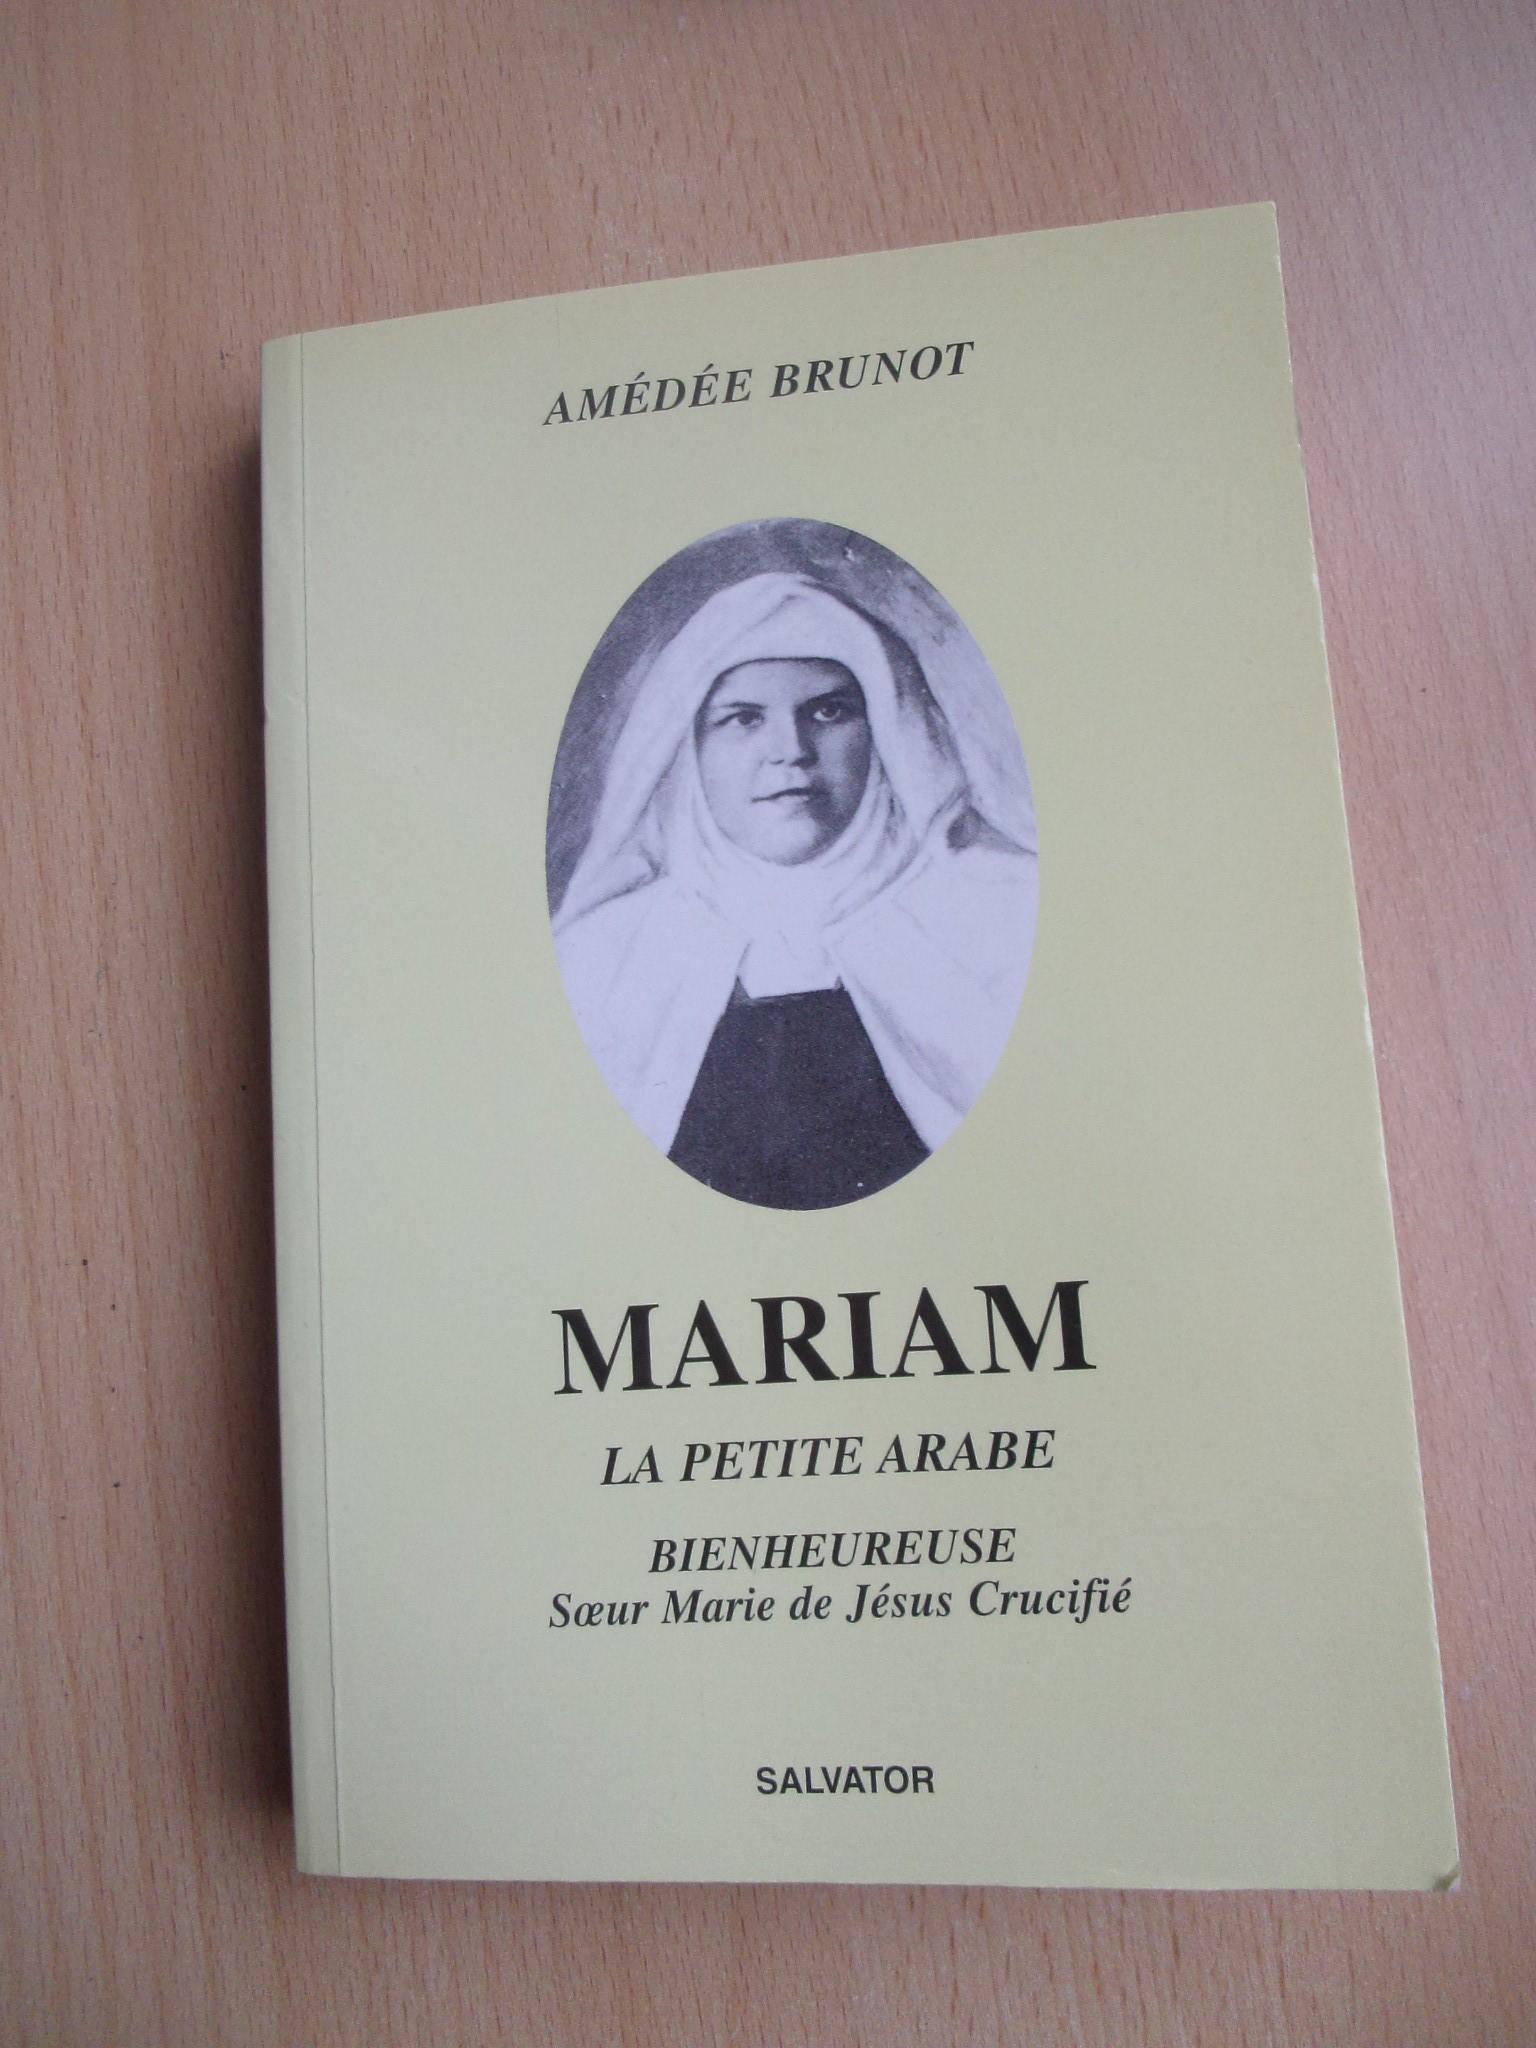 Livre : Mariam, la petite arabe. Bienheureuse. (Livre neuf)  14 Lourdes (65)